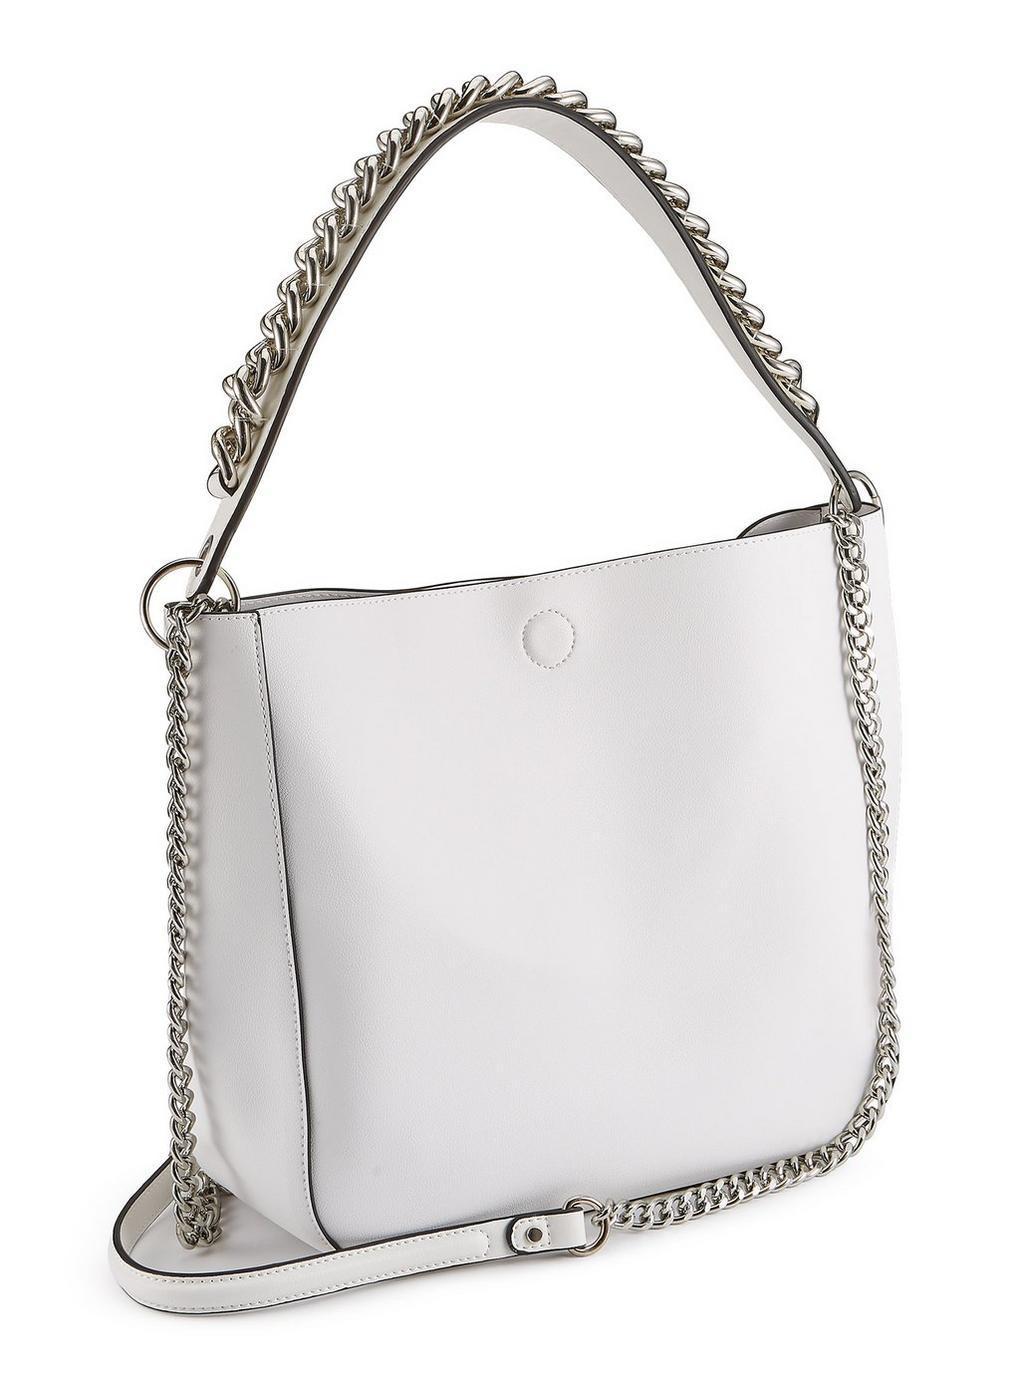 Miss Selfridge Women S White Chain Detail Shoulder Bag